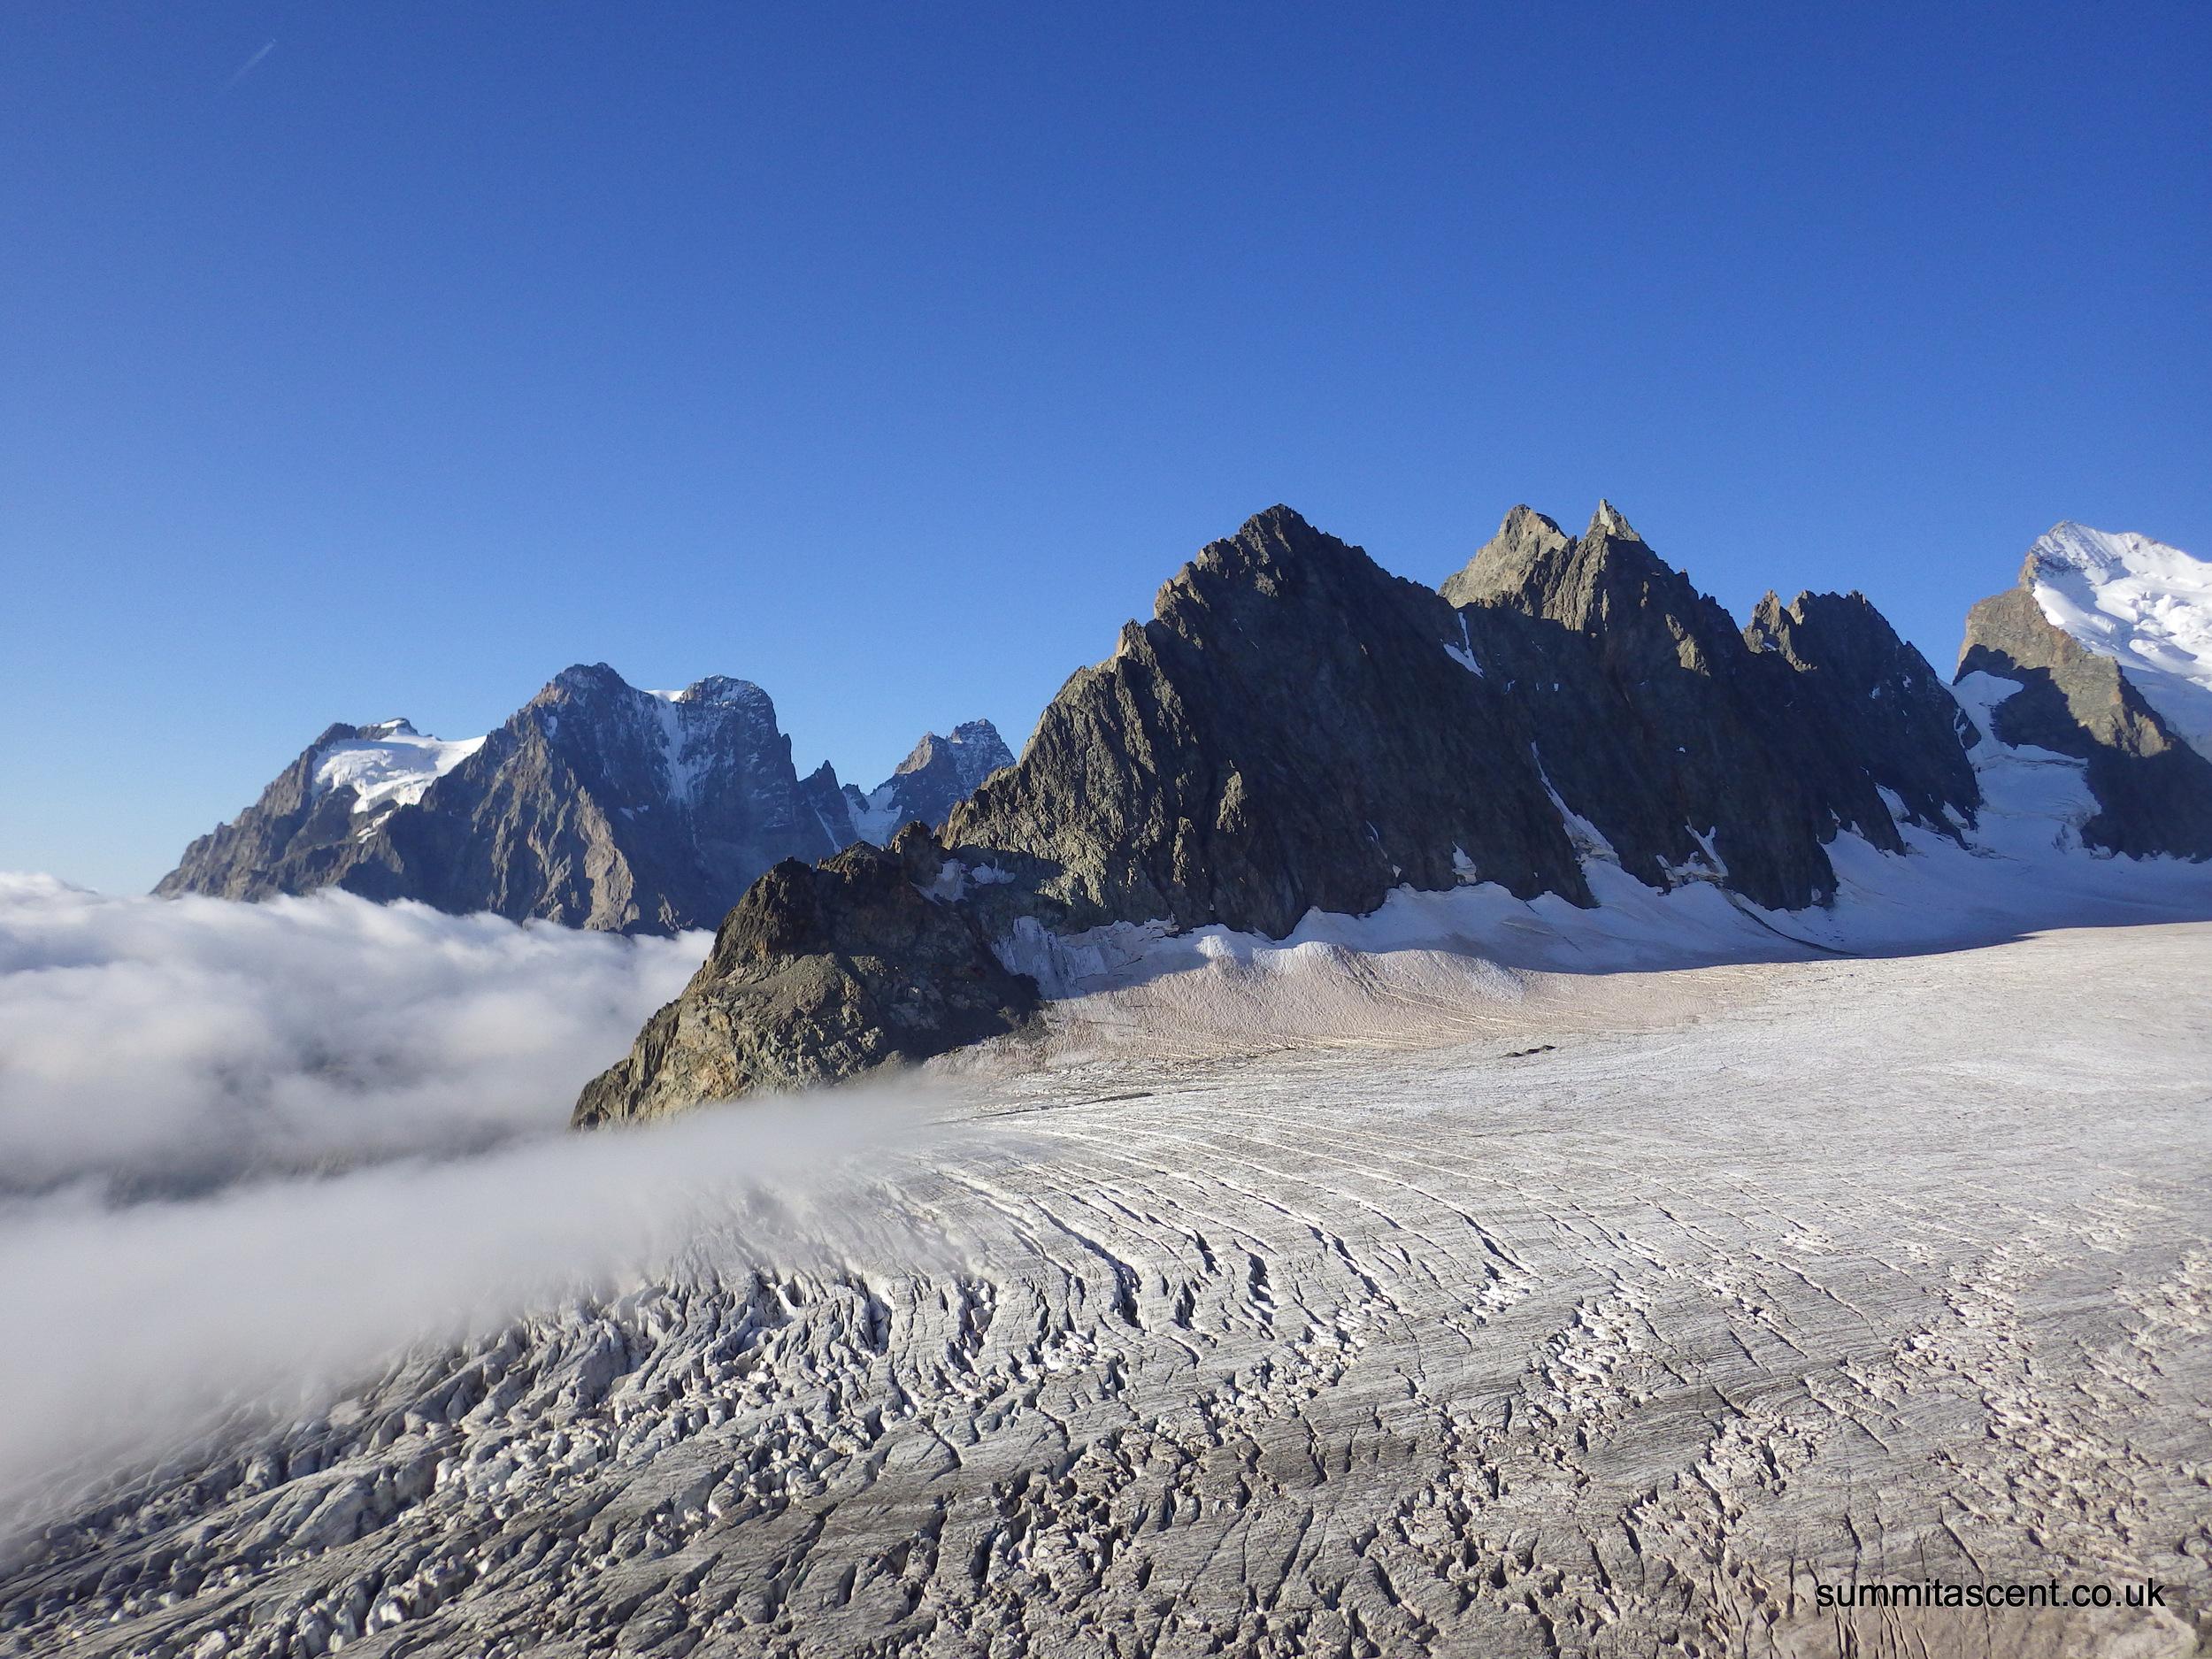 Glacier Blanc, Pointe de la Grande Sagne and with Mont Pelvoux in the background